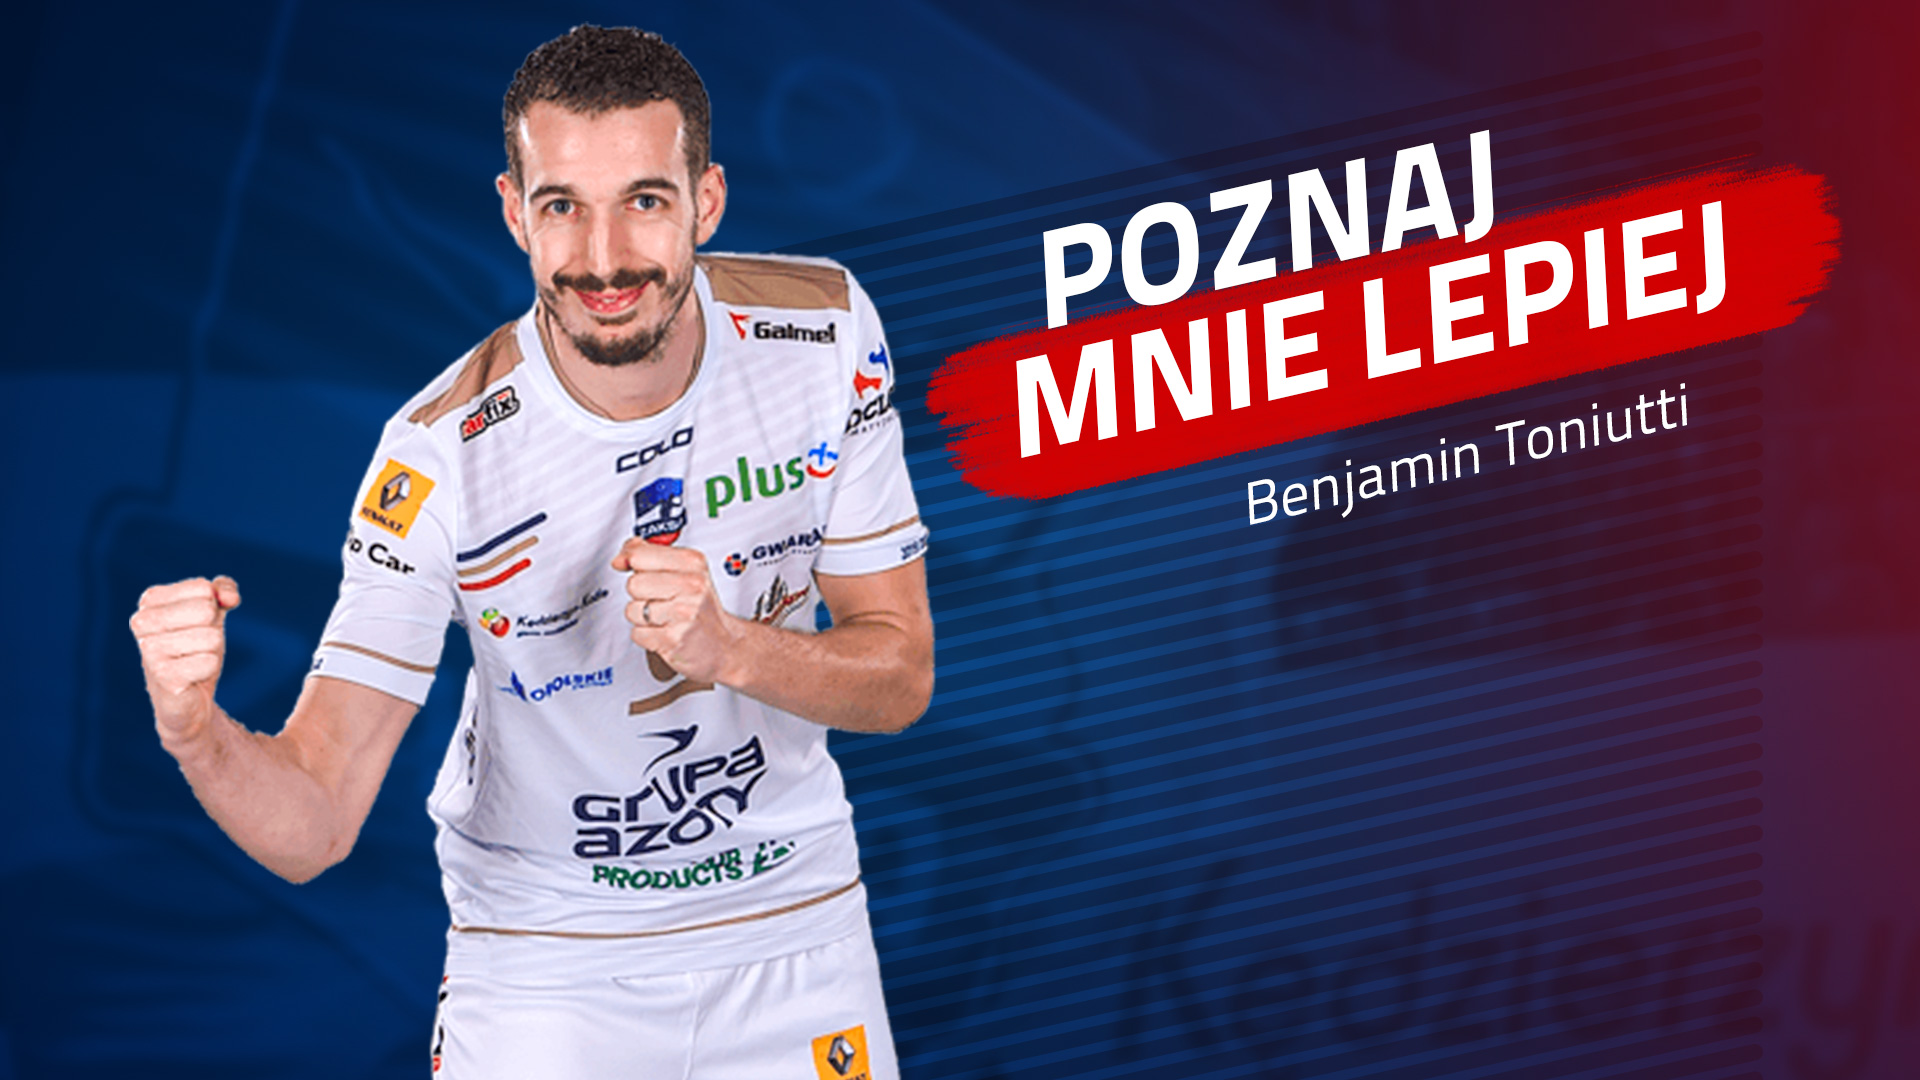 Poznaj mnie lepiej: Benjamin Toniutti